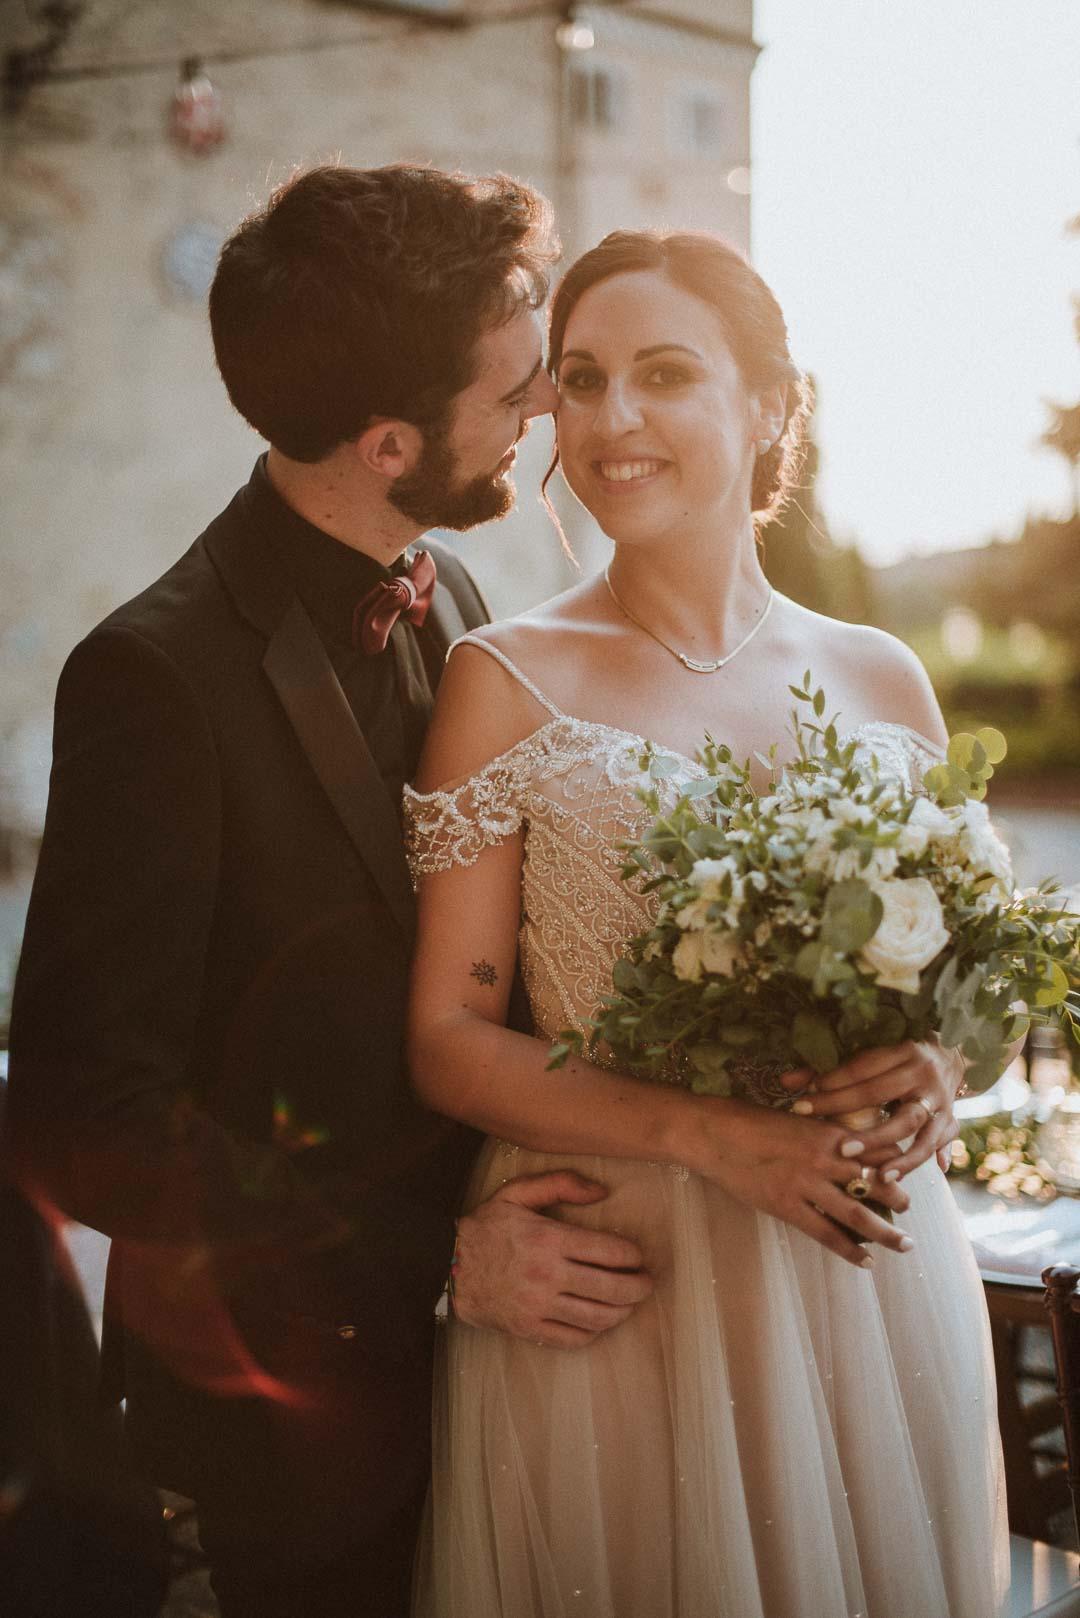 wedding-photographer-destination-fineart-bespoke-reportage-tuscany-villascorzi-vivianeizzo-spazio46-130